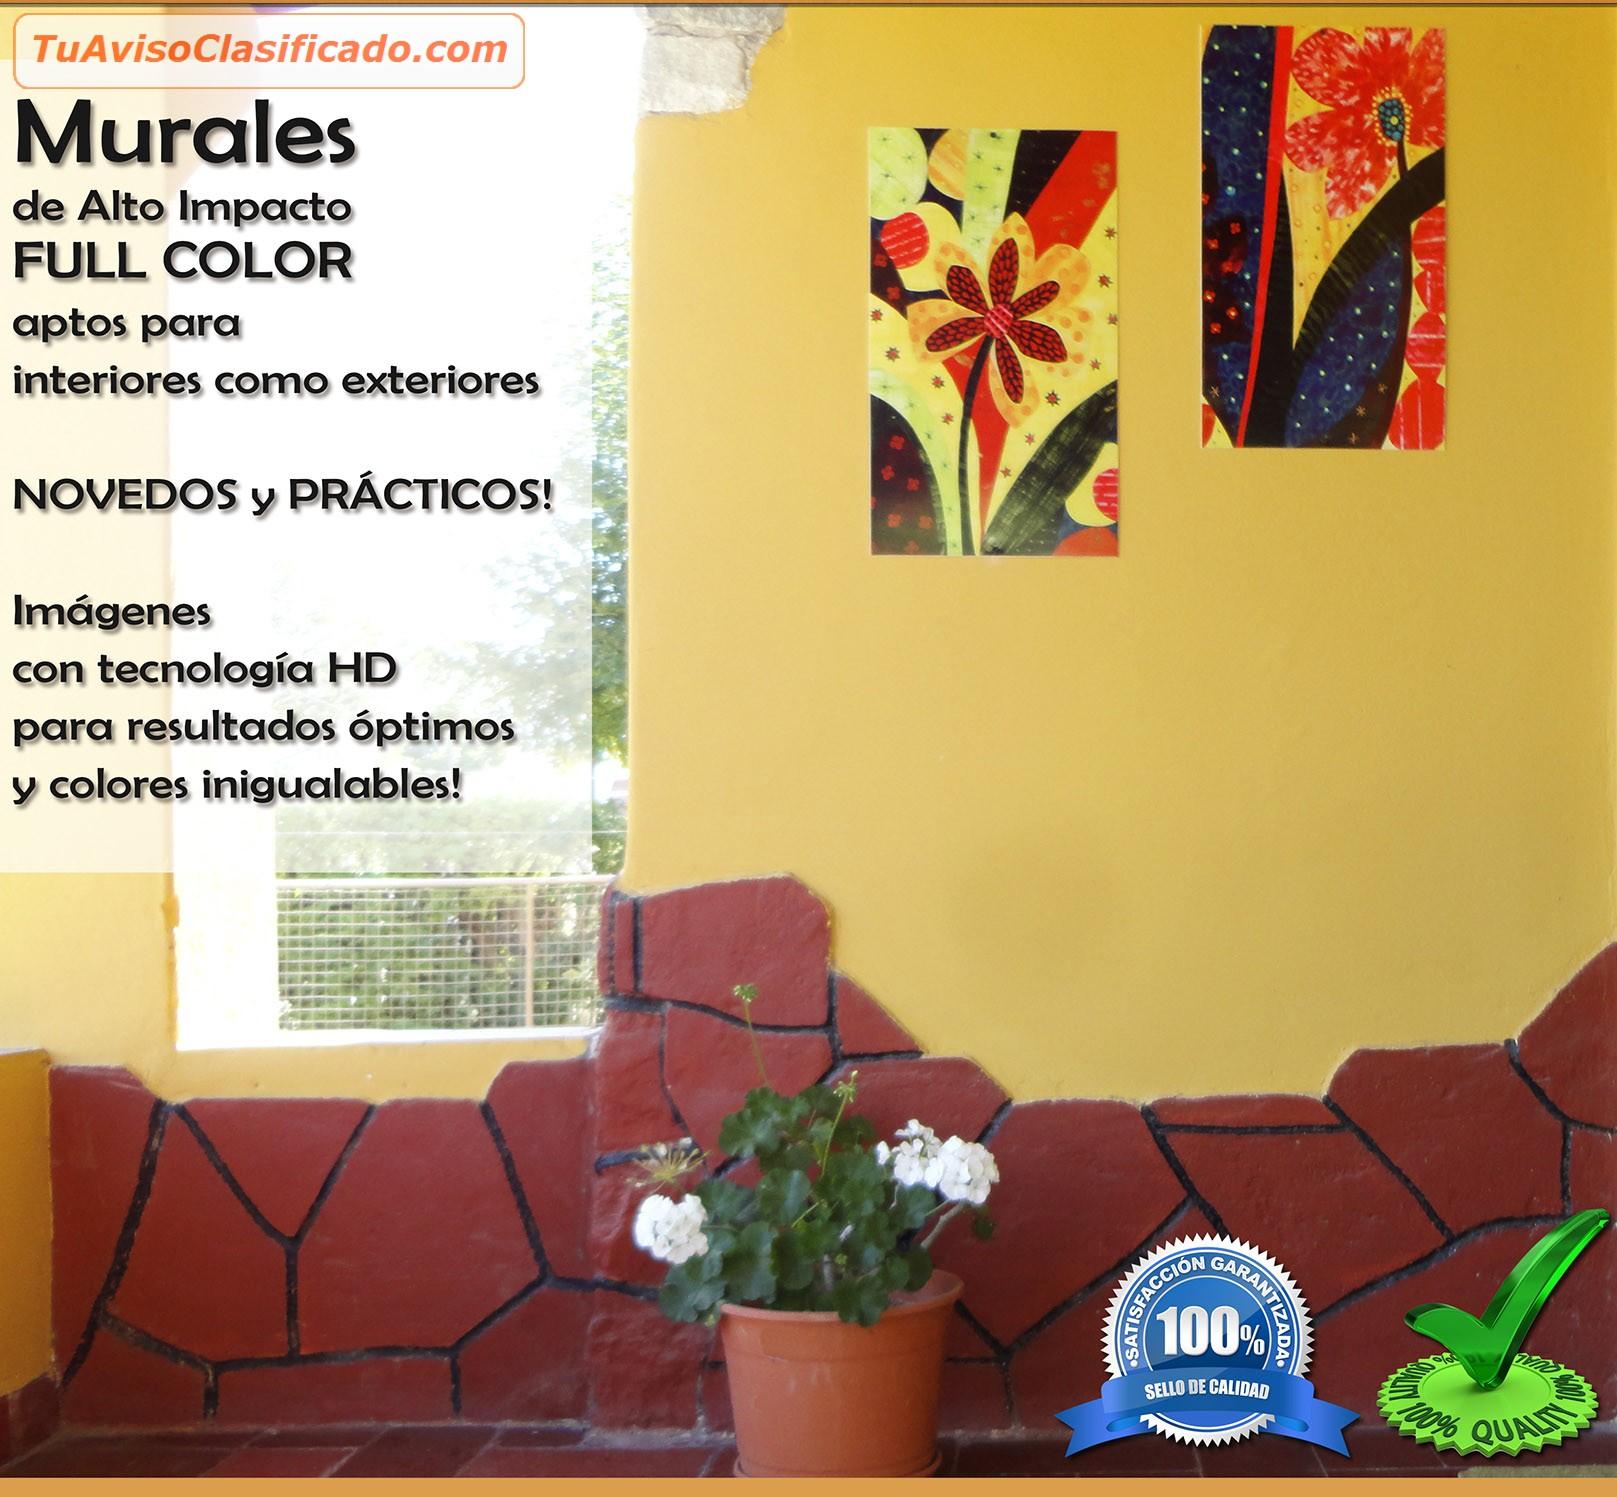 Murales modernos para interior y exterior vanguardia Murales decorativos para exteriores